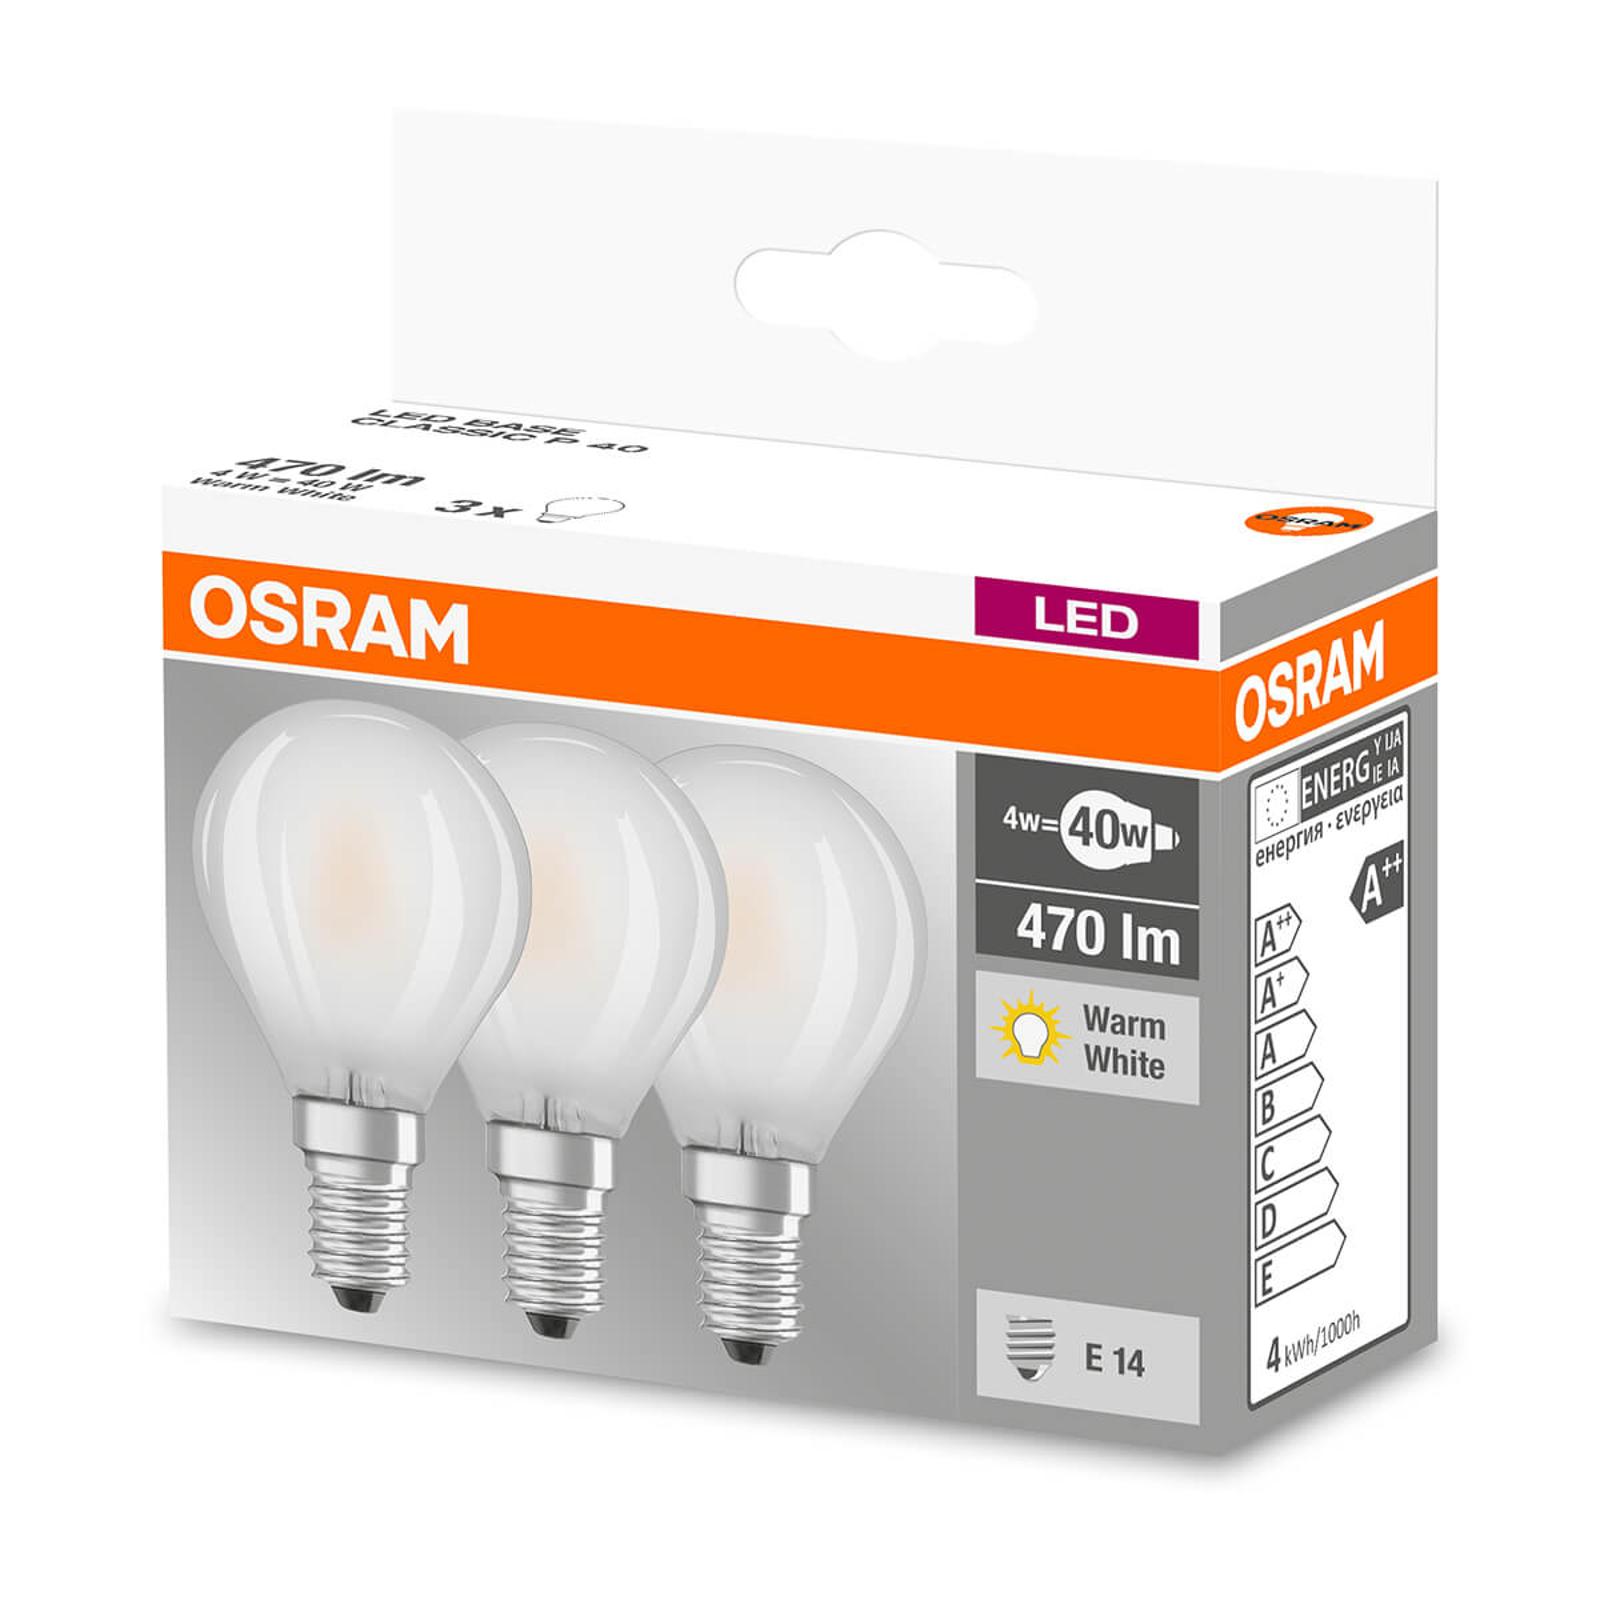 Żarówka LED E14 4W ciepła biel 470 lumenów, 3 szt.